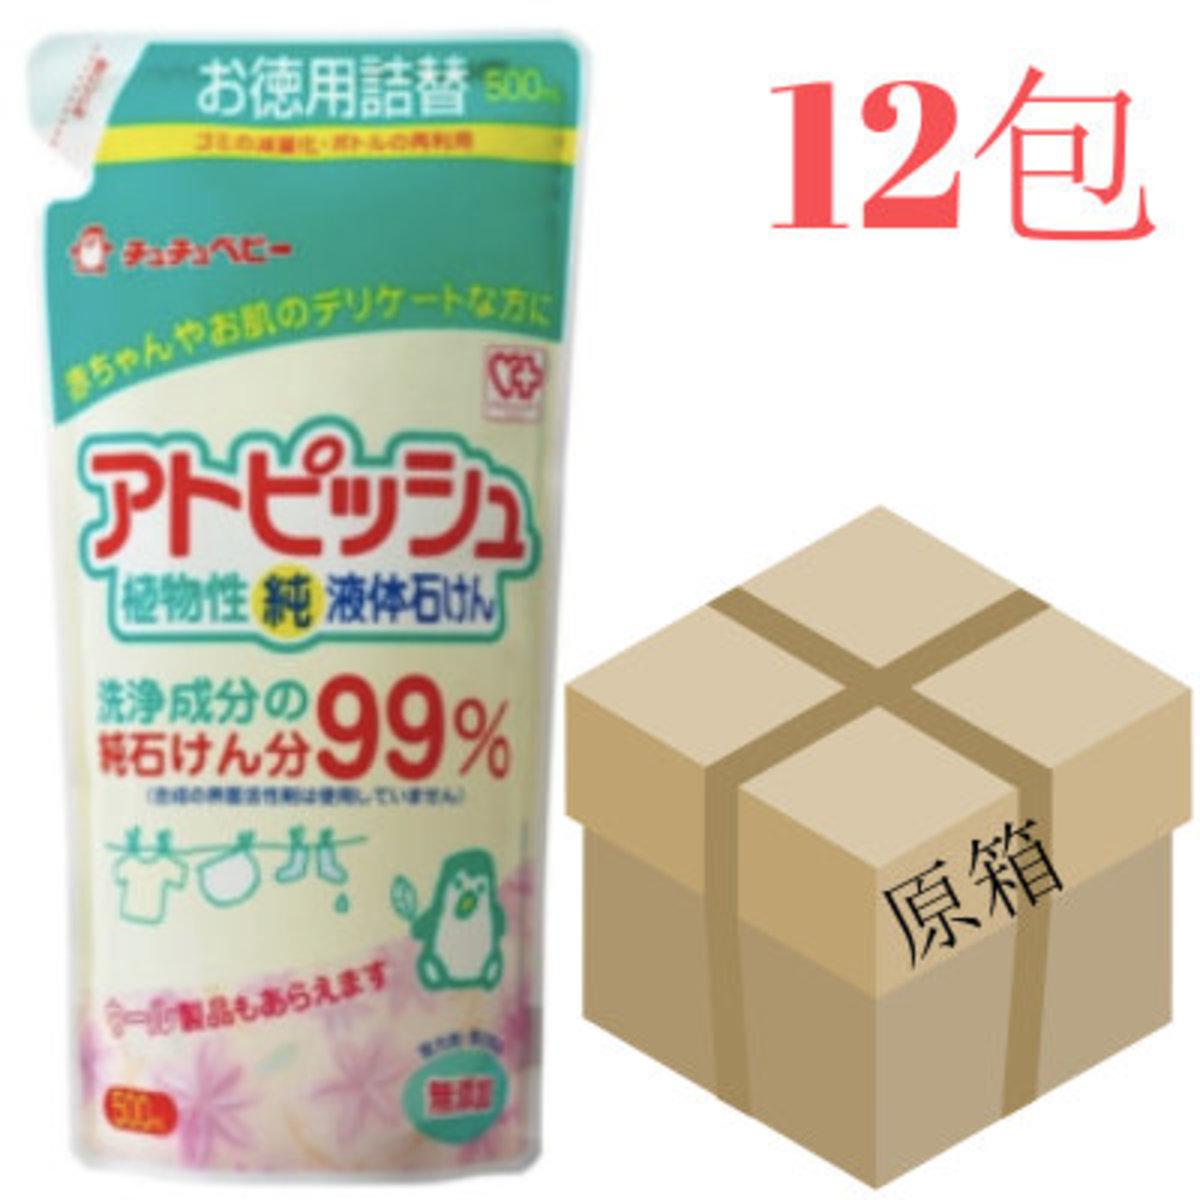 12 pcs ChuChuBaby Liquid Laundry 500ml (Refill)